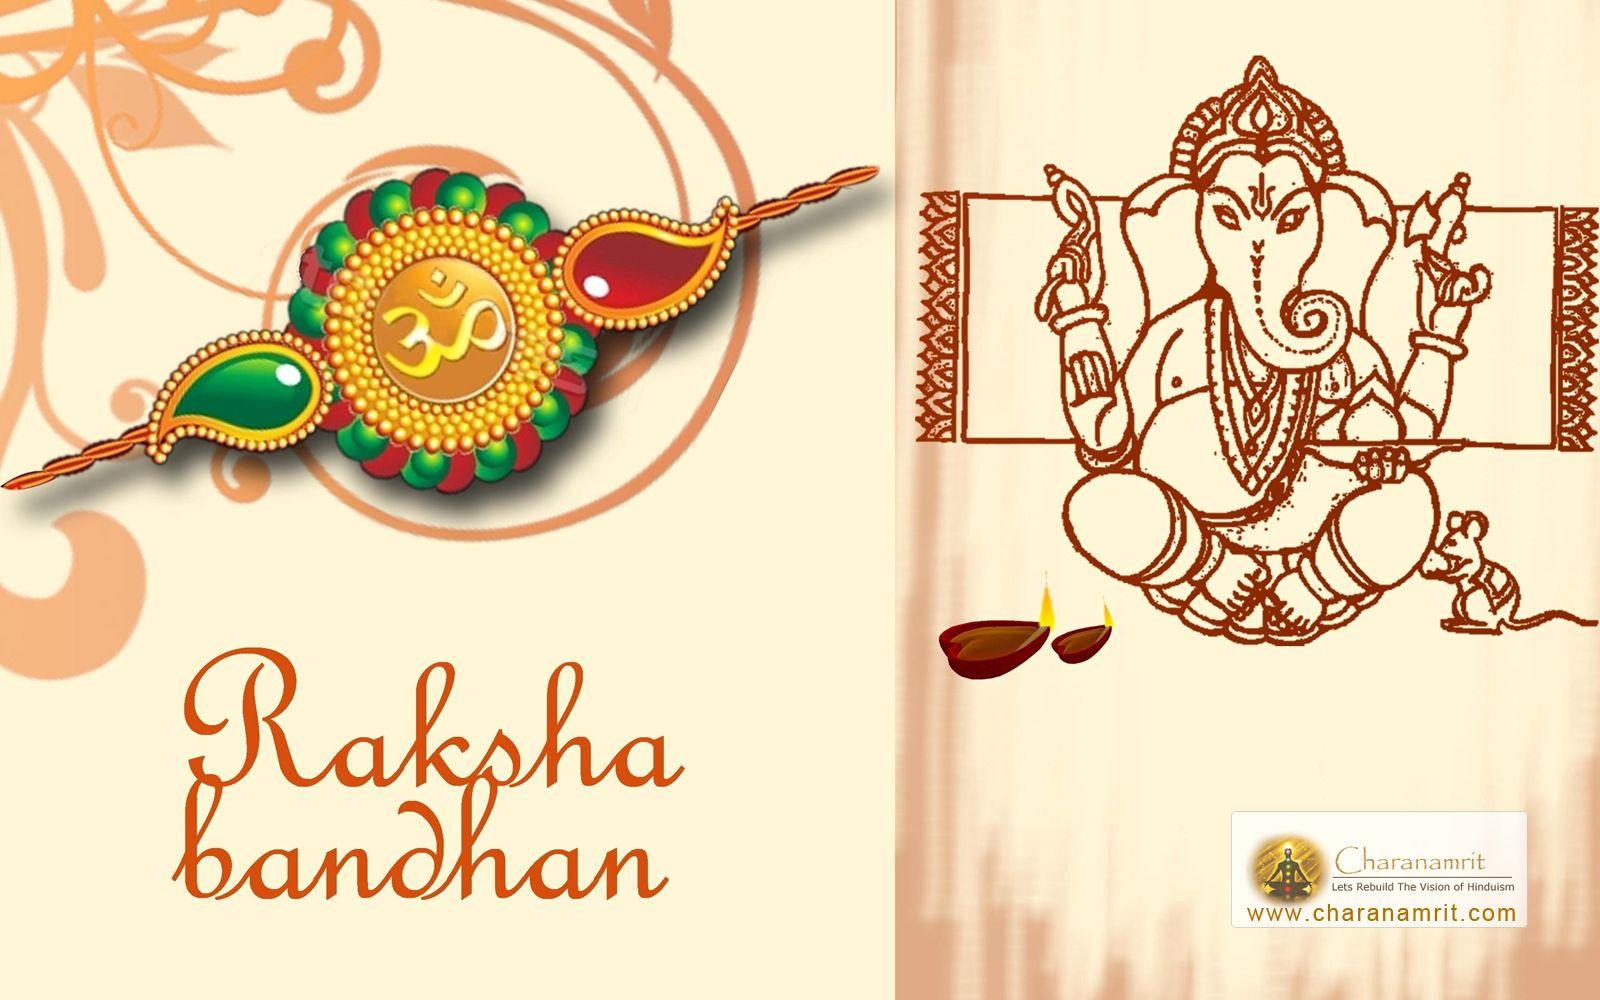 Happy Raksha Bandhan Ganesha Wallpaper Free Download From